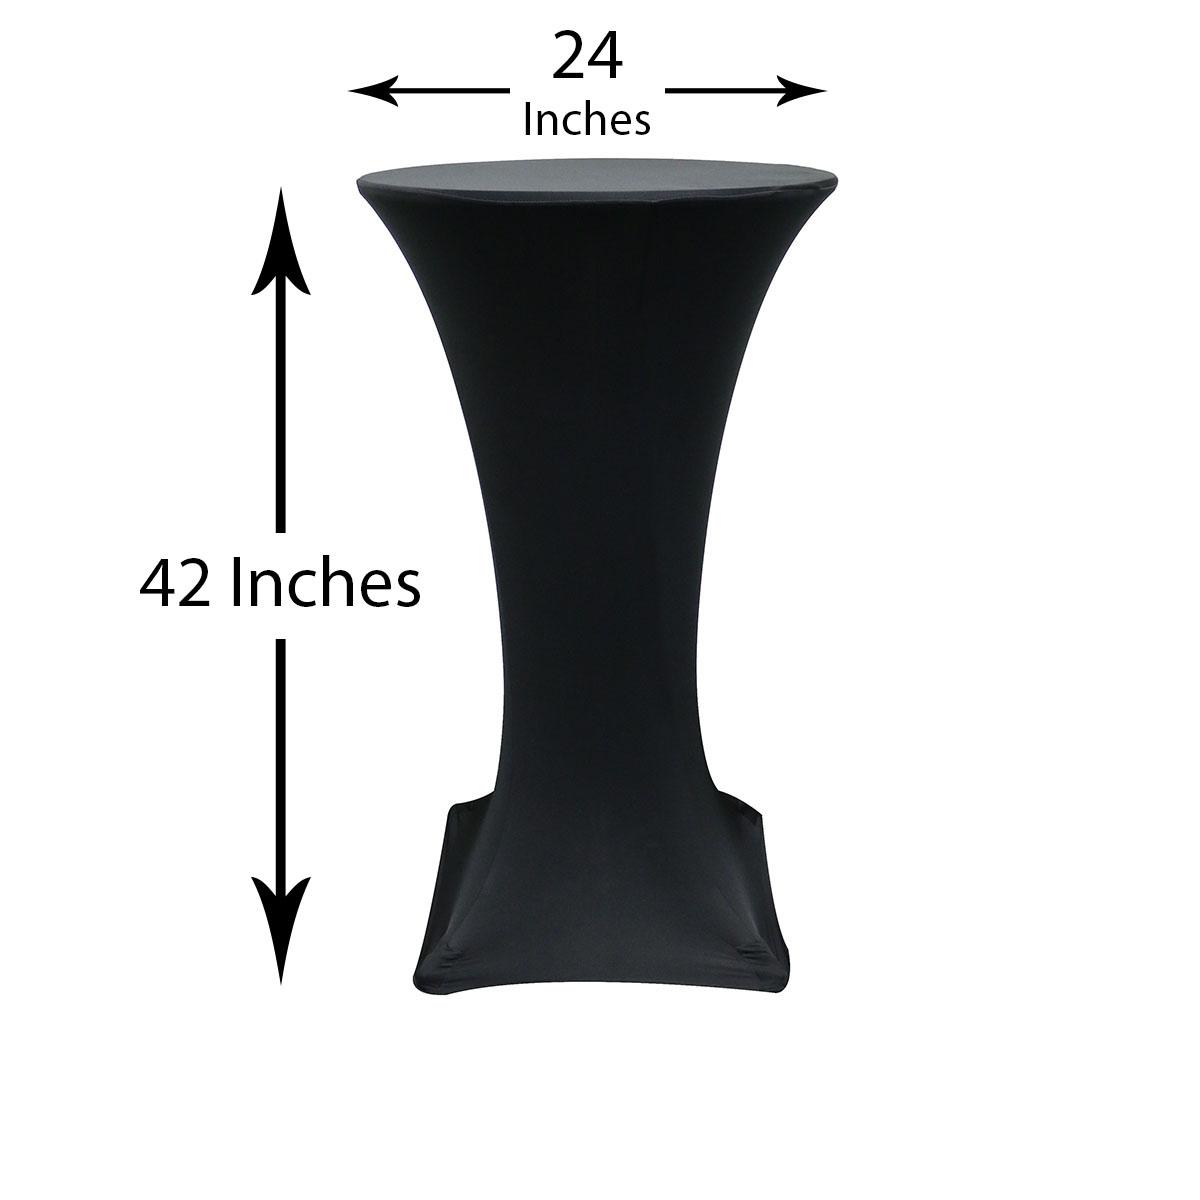 Cocktail tables 24-inch-highboy-cocktail-spandex-tablecloths-black- ... CZFOKOG